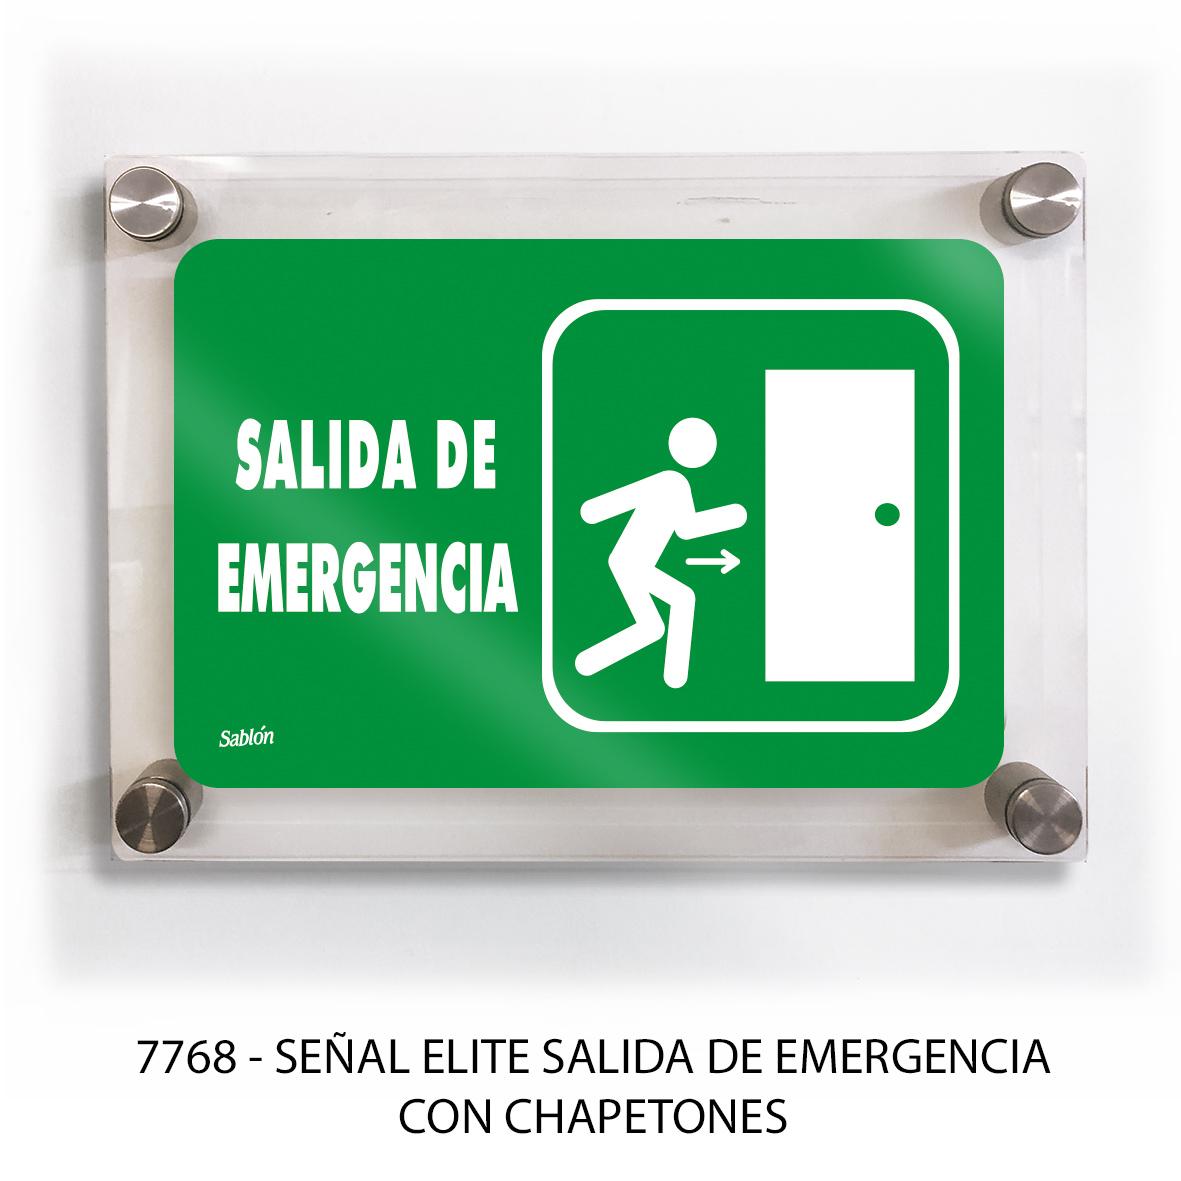 Señal salida de emergencia con chapetones línea elite modelo 7768 Sablón